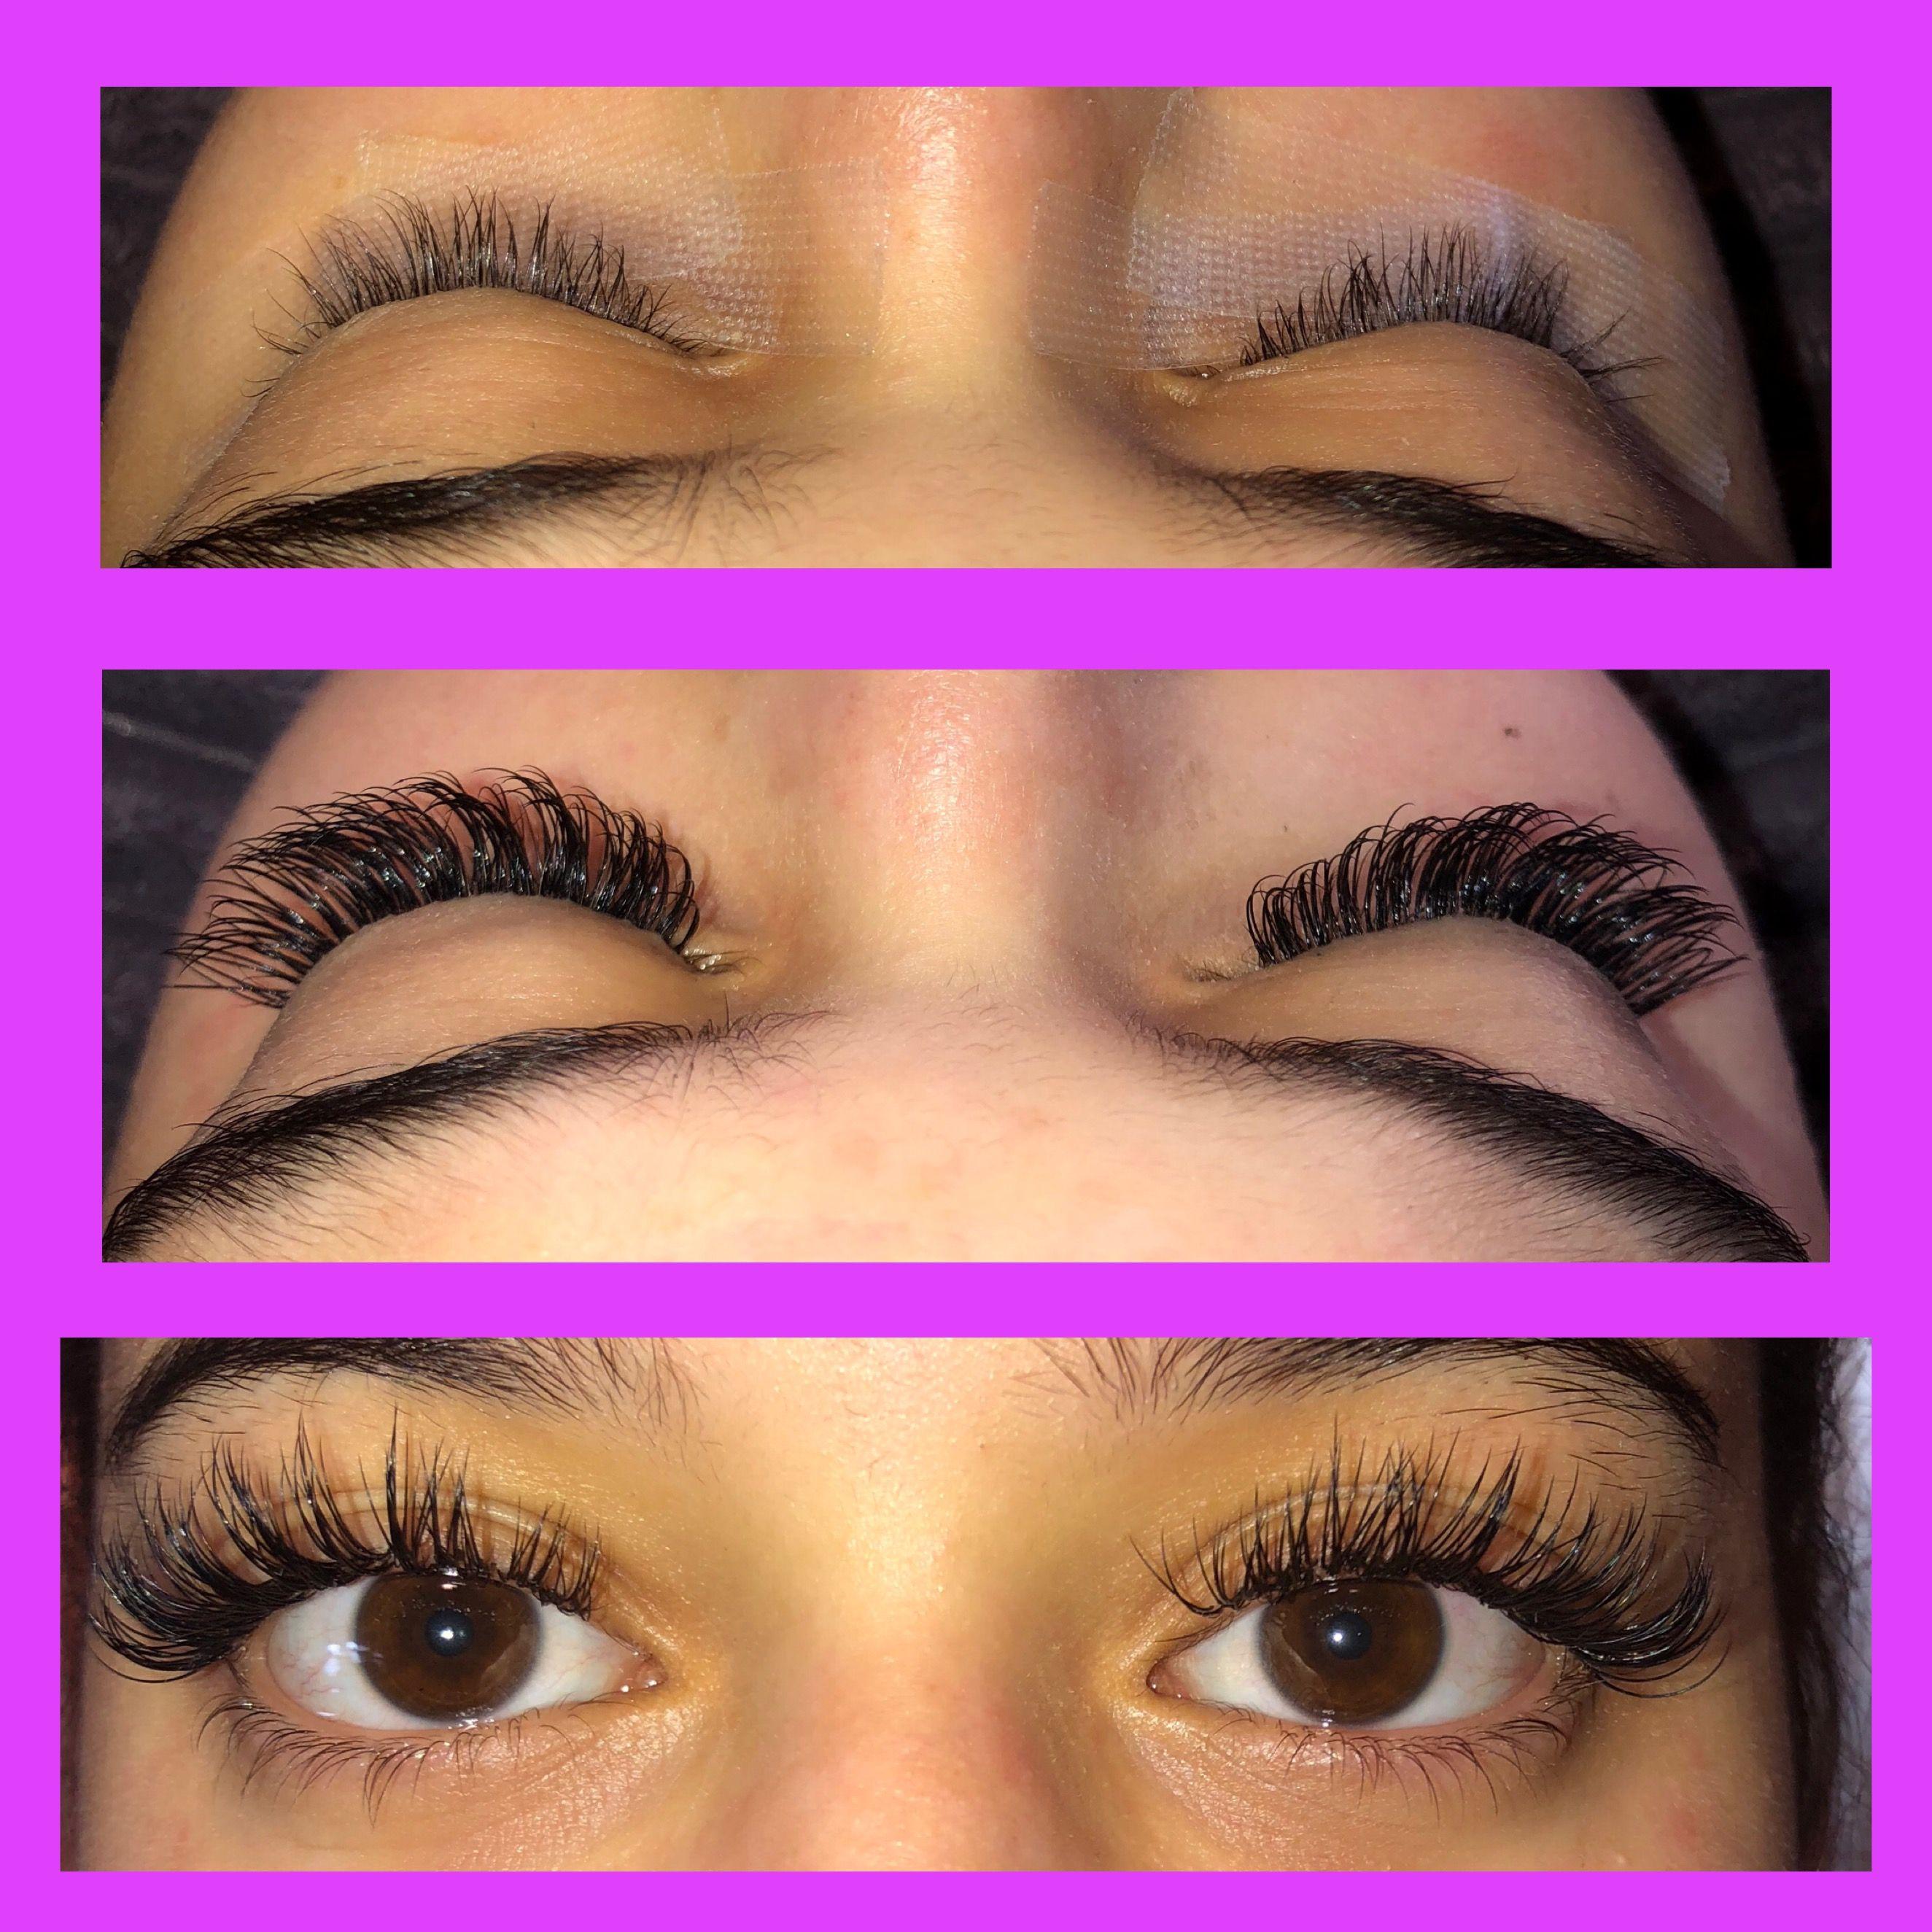 Pin by lalalashes on eyelash Eyelash extensions, Lashes